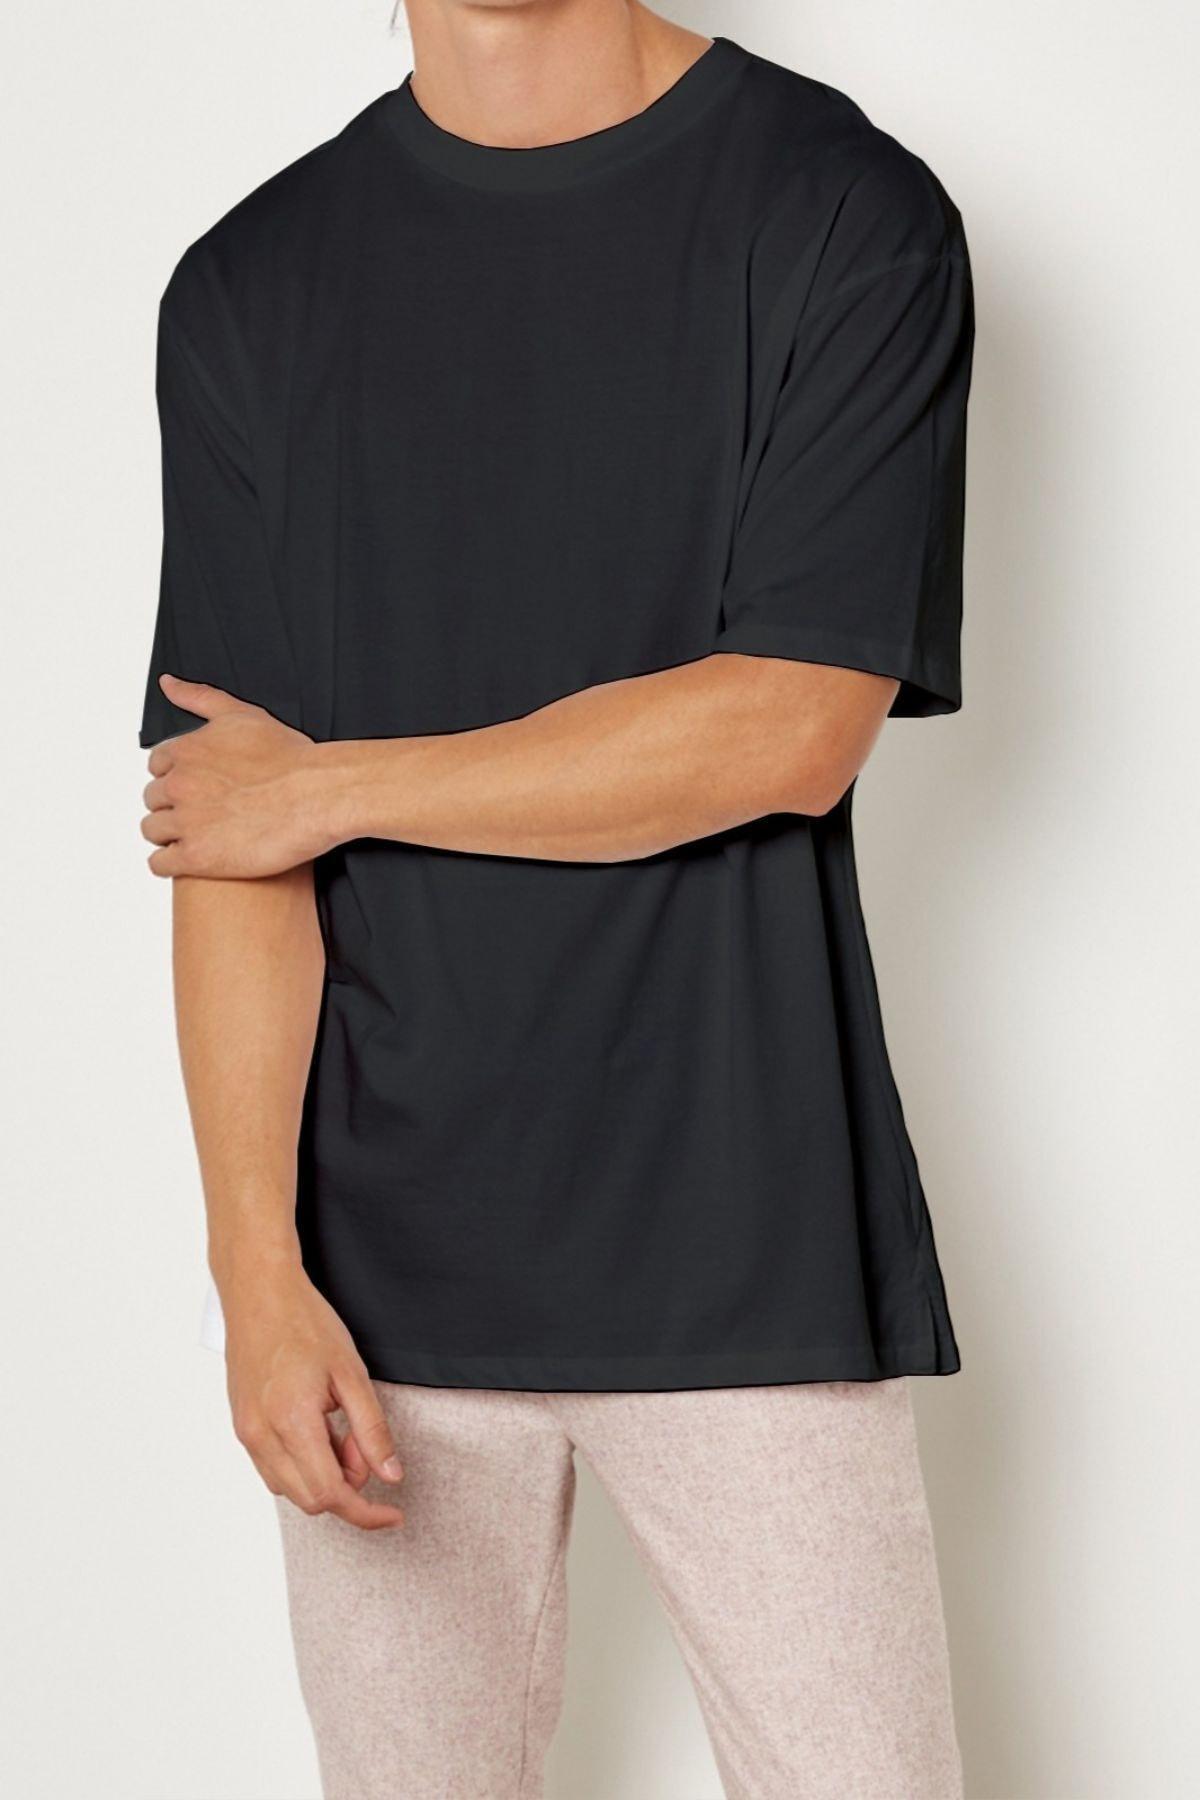 Relax&Basic Erkek Siyah Pamuklu Kısa Kollu Tişört 1